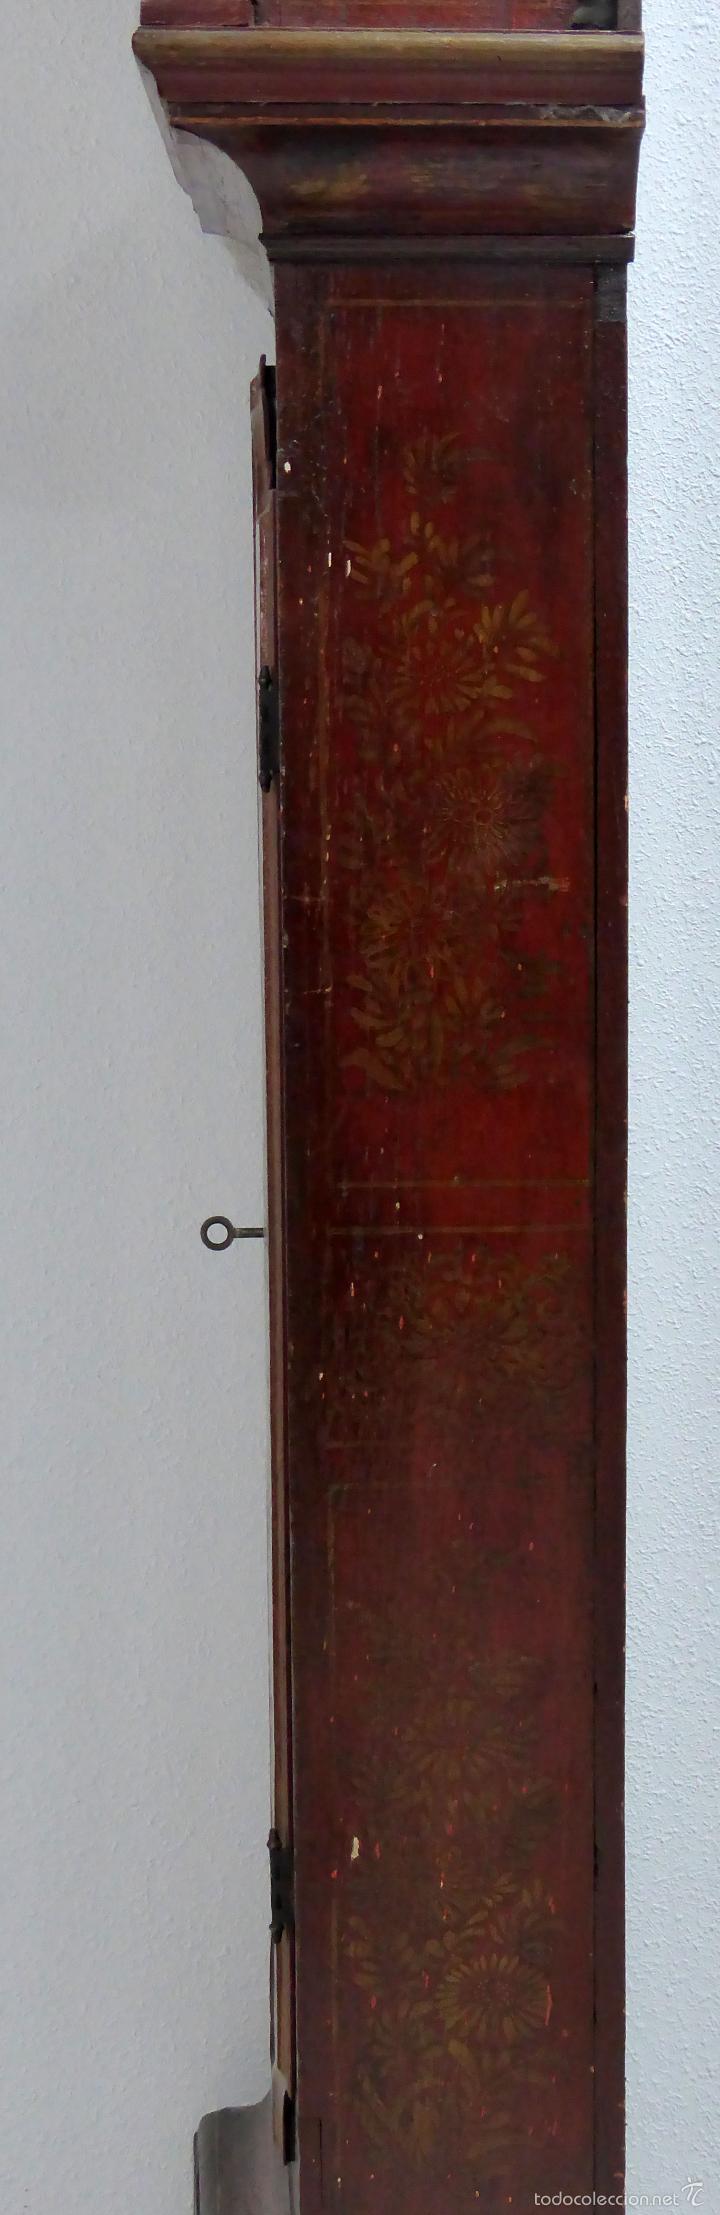 Relojes de pie: Reloj pie inglés laca japanning chinoseries S XVIII Maquinaria William Fidgett London Funciona - Foto 24 - 58294331